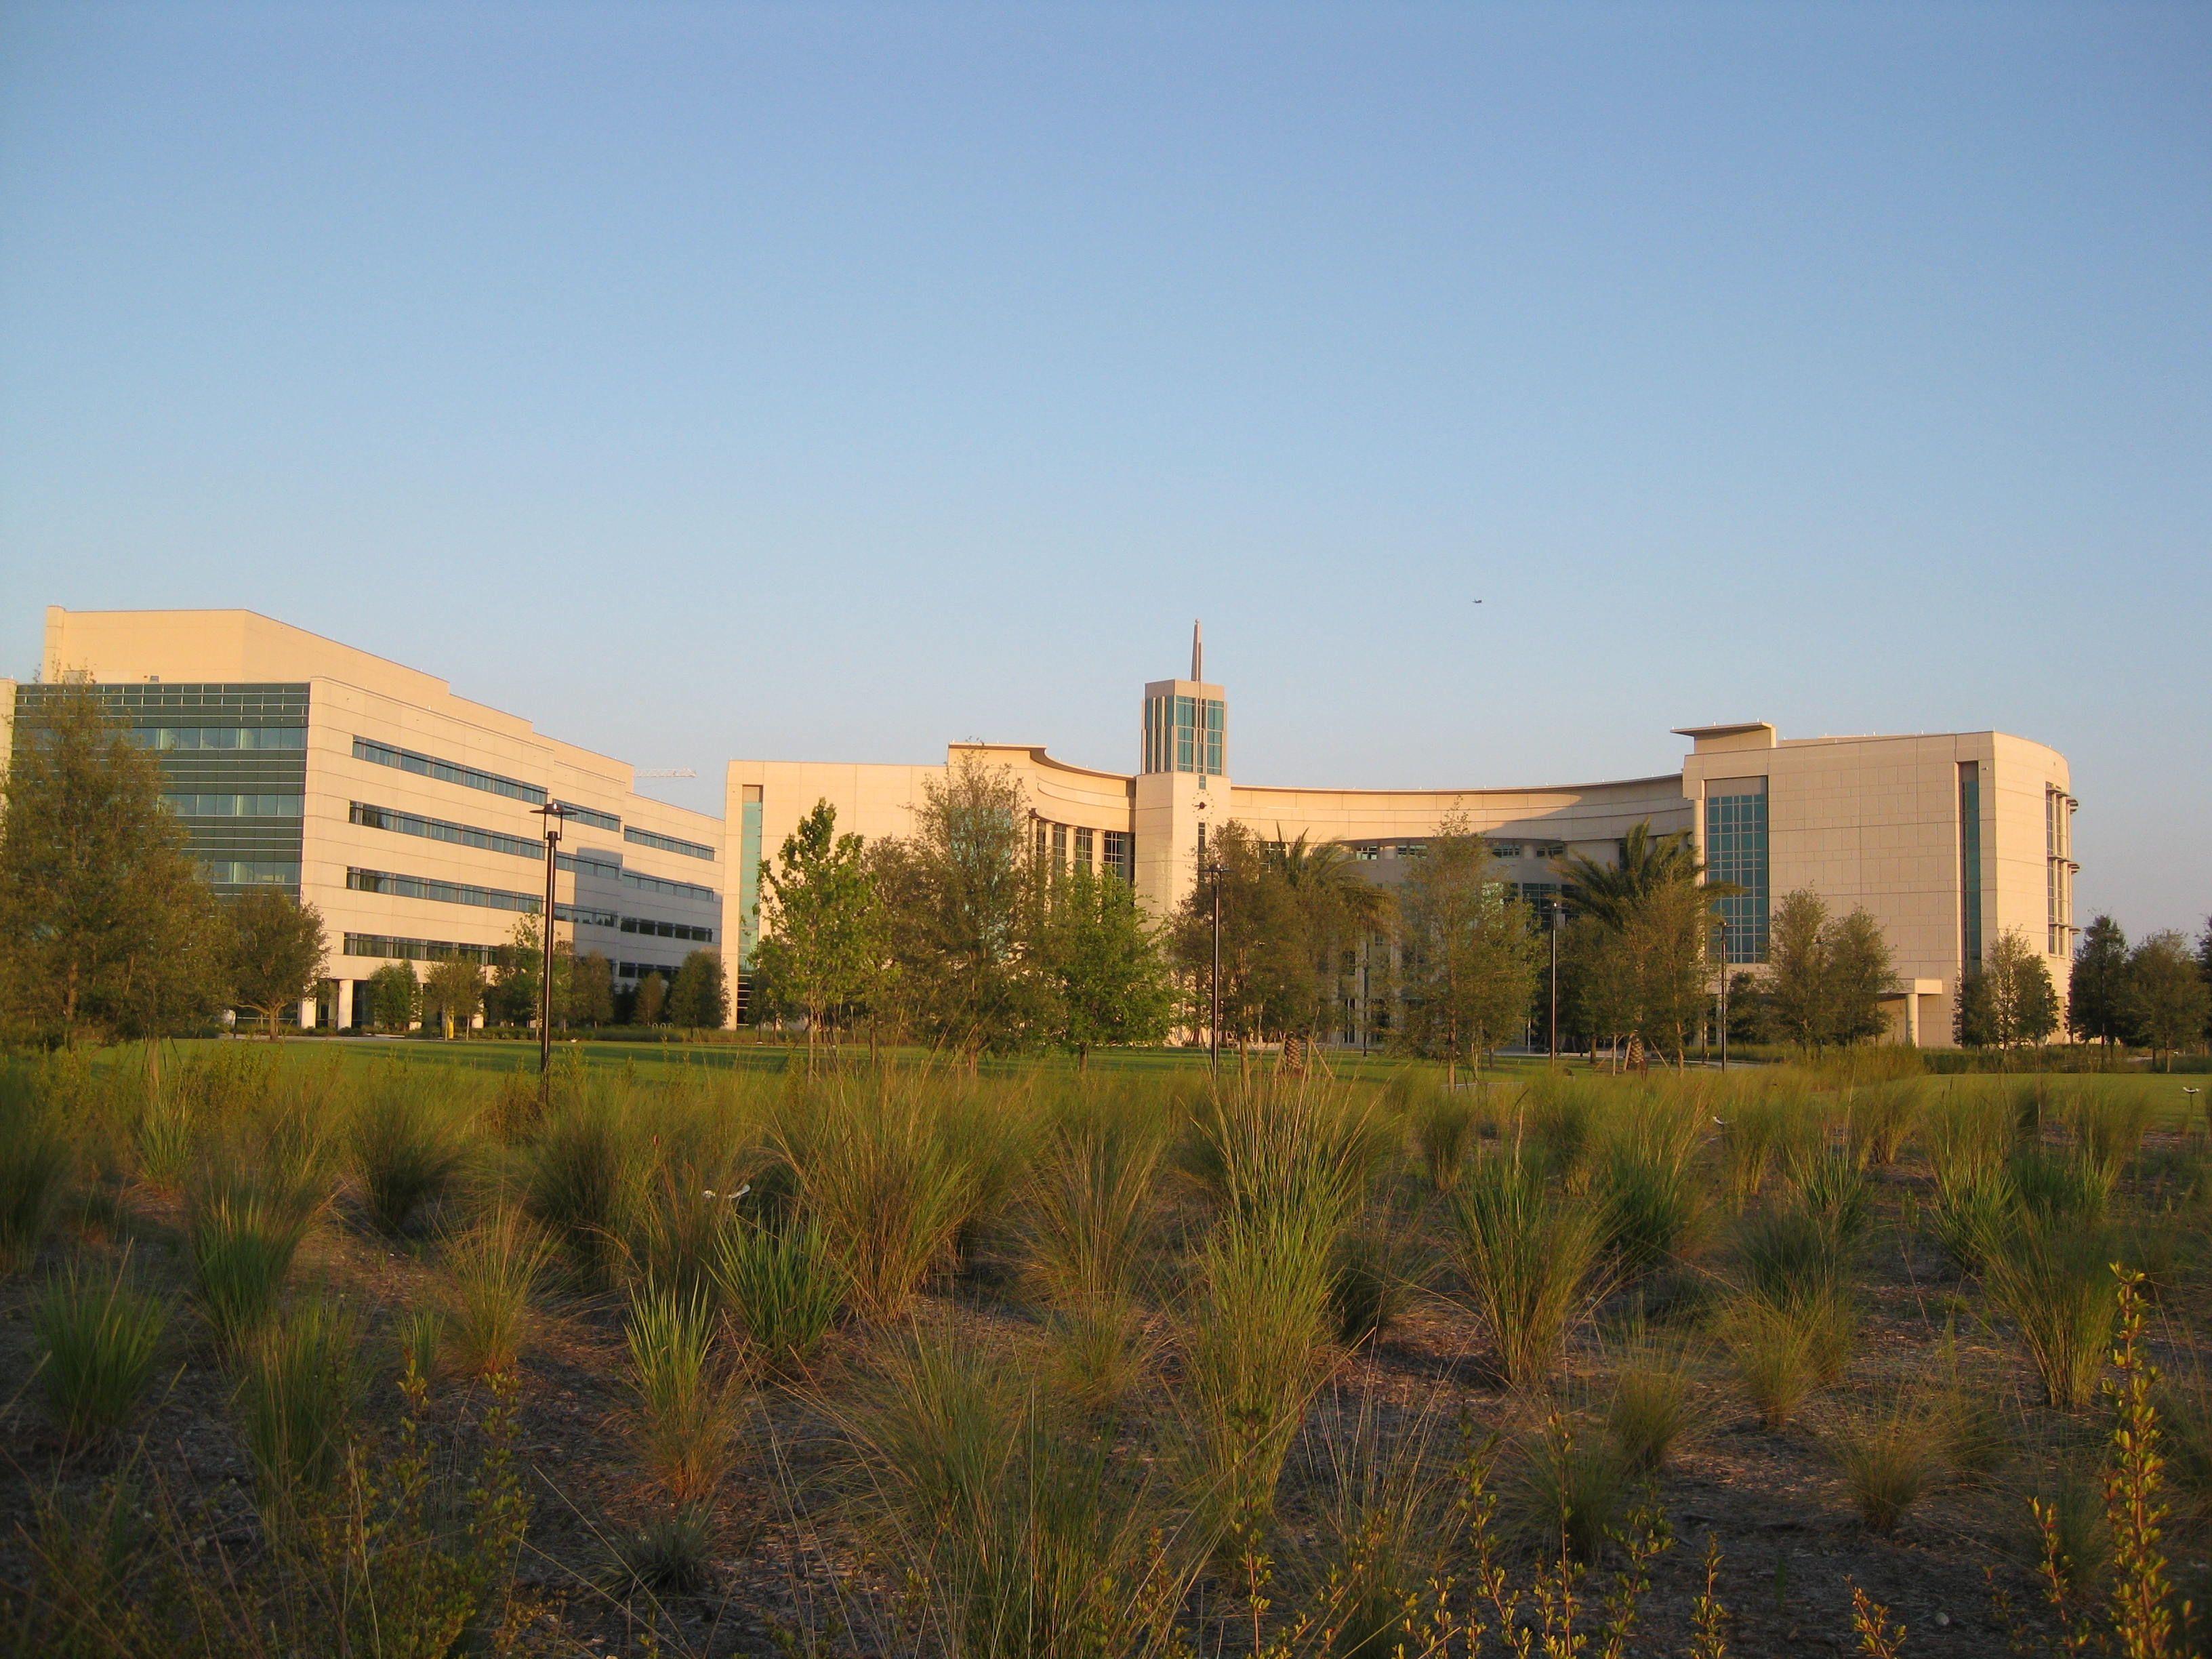 University Of Central Florida Health Sciences Campus At Lake Nona College Of Medicine University Of Central Florida Central Florida Campus